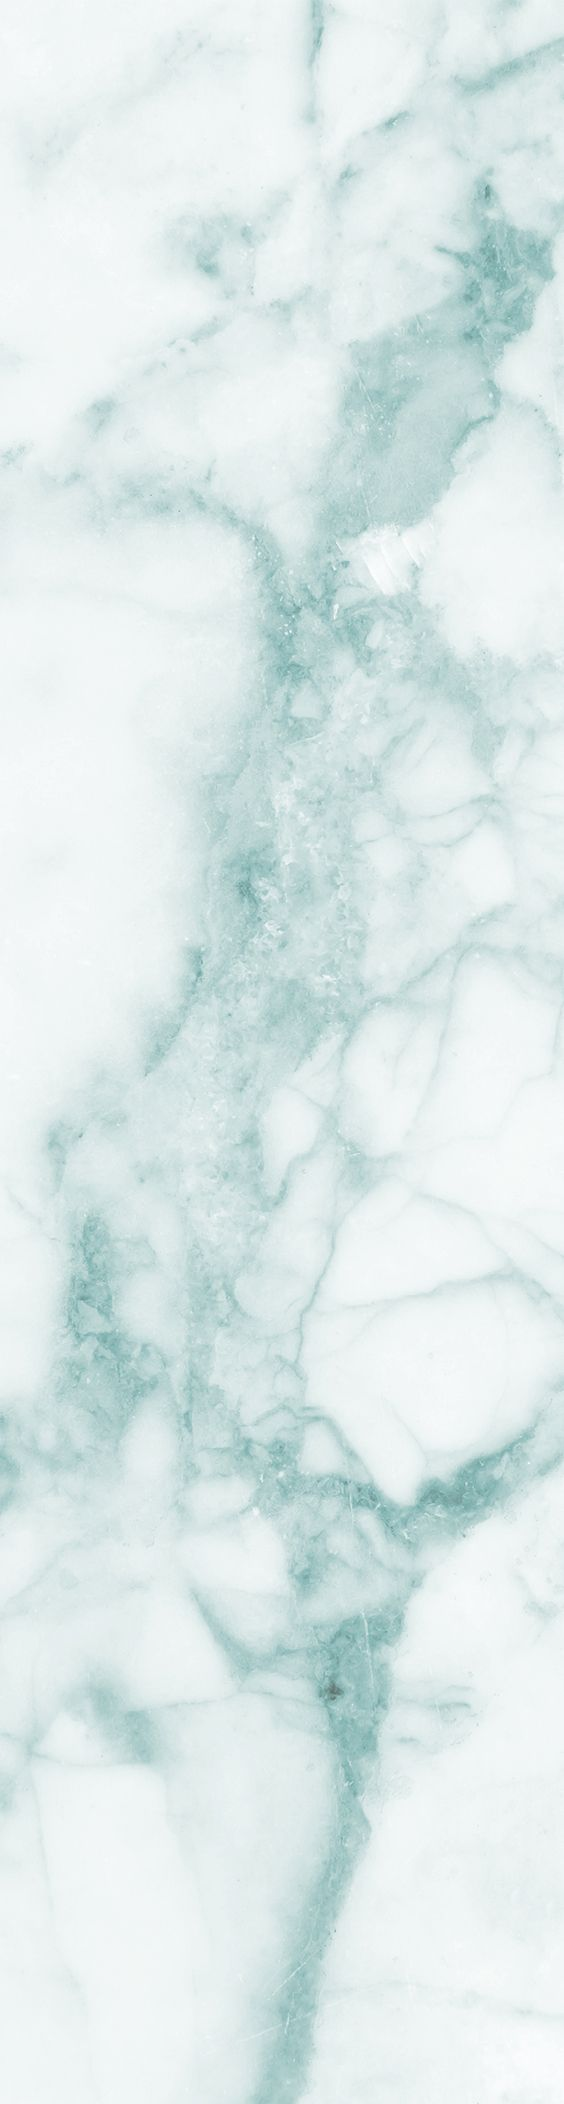 Simple Wallpaper Marble Mint Green - 2fe1ea5f56b52d3aa05530743d2074a9--iphone-plant-wallpaper-marble-wallpaper  Collection_43727.jpg